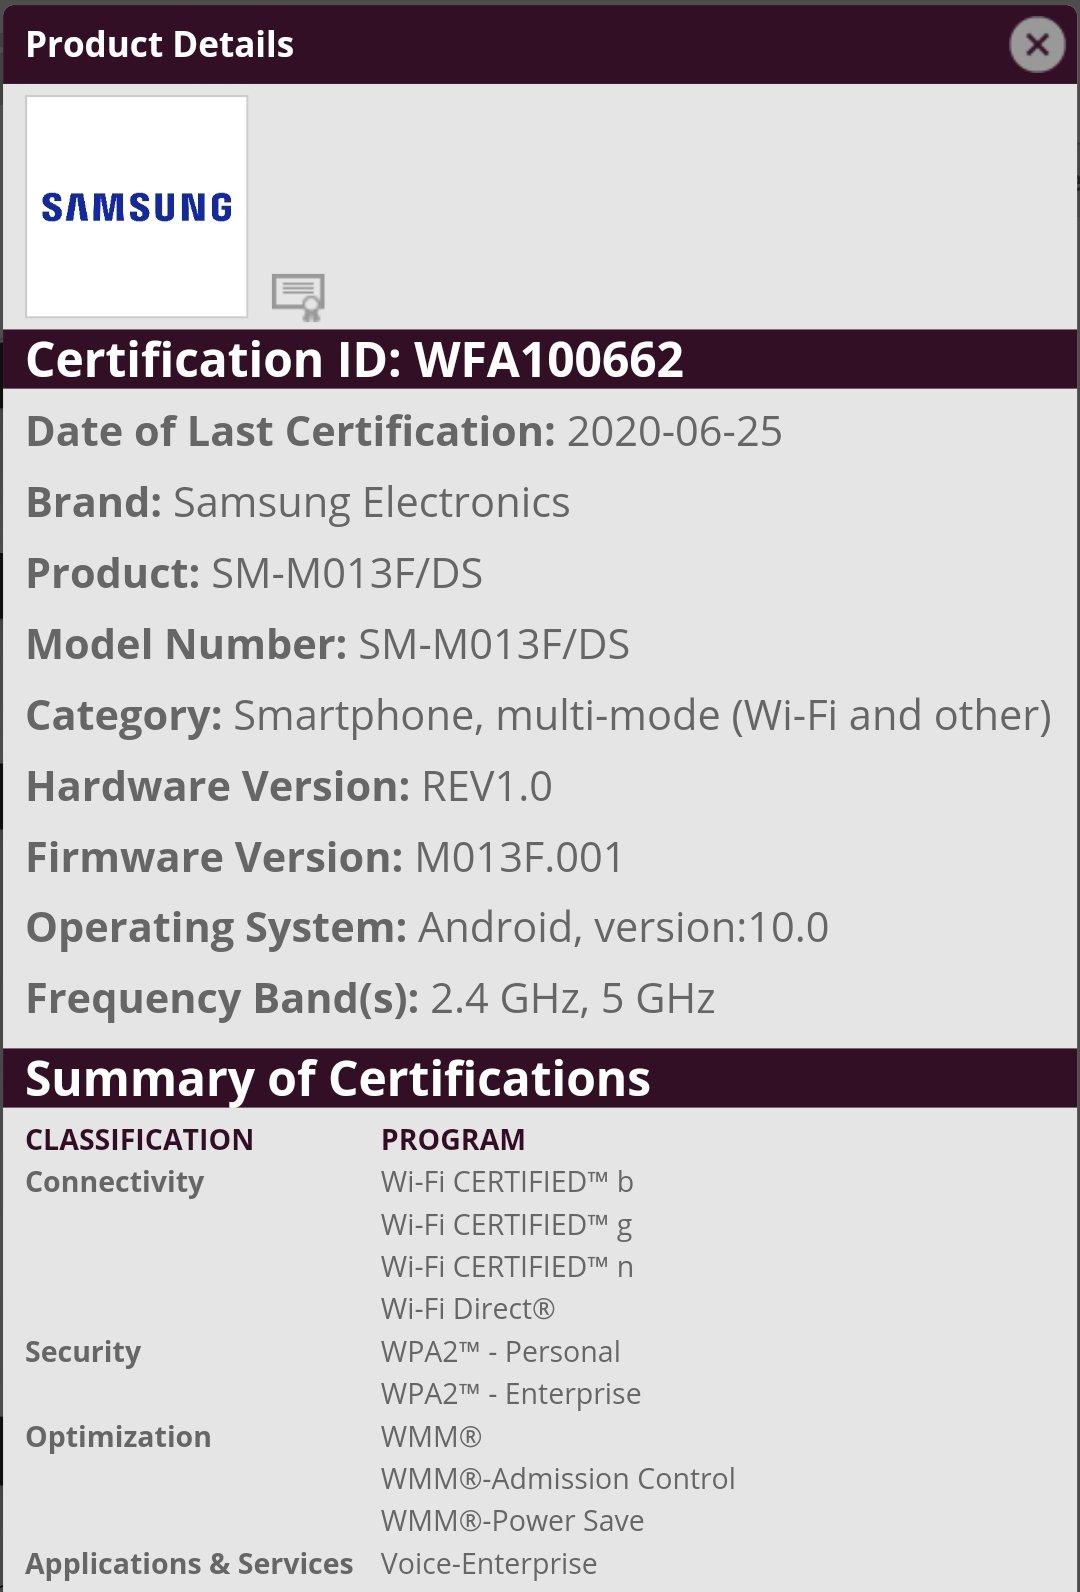 Galaxy M01 Core (SM-M013F/DS) bags Wi-Fi Alliance certification